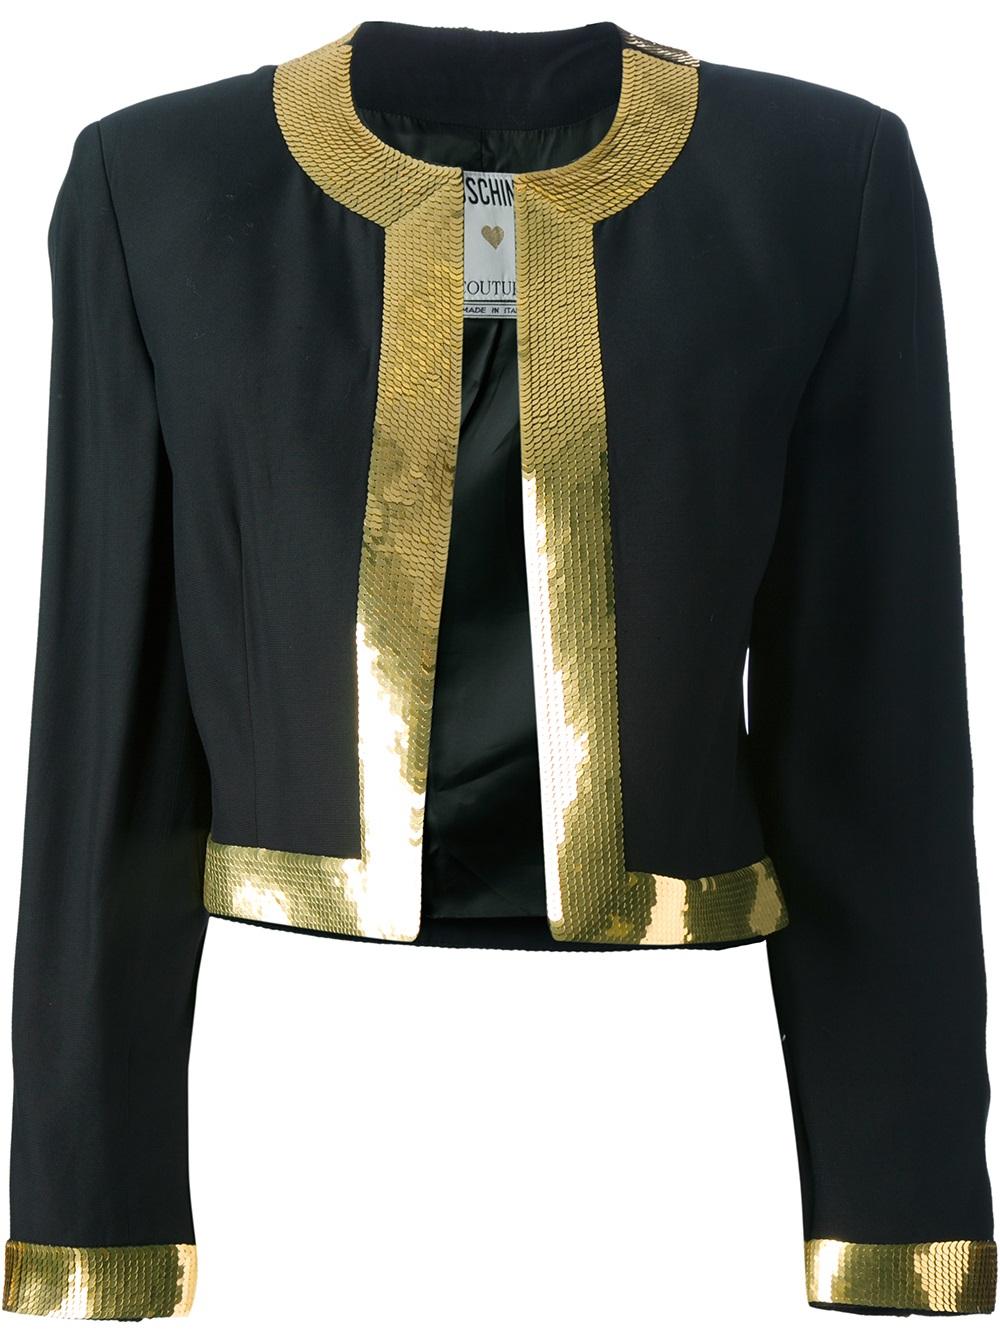 moschino cropped bolero jacket in black lyst. Black Bedroom Furniture Sets. Home Design Ideas